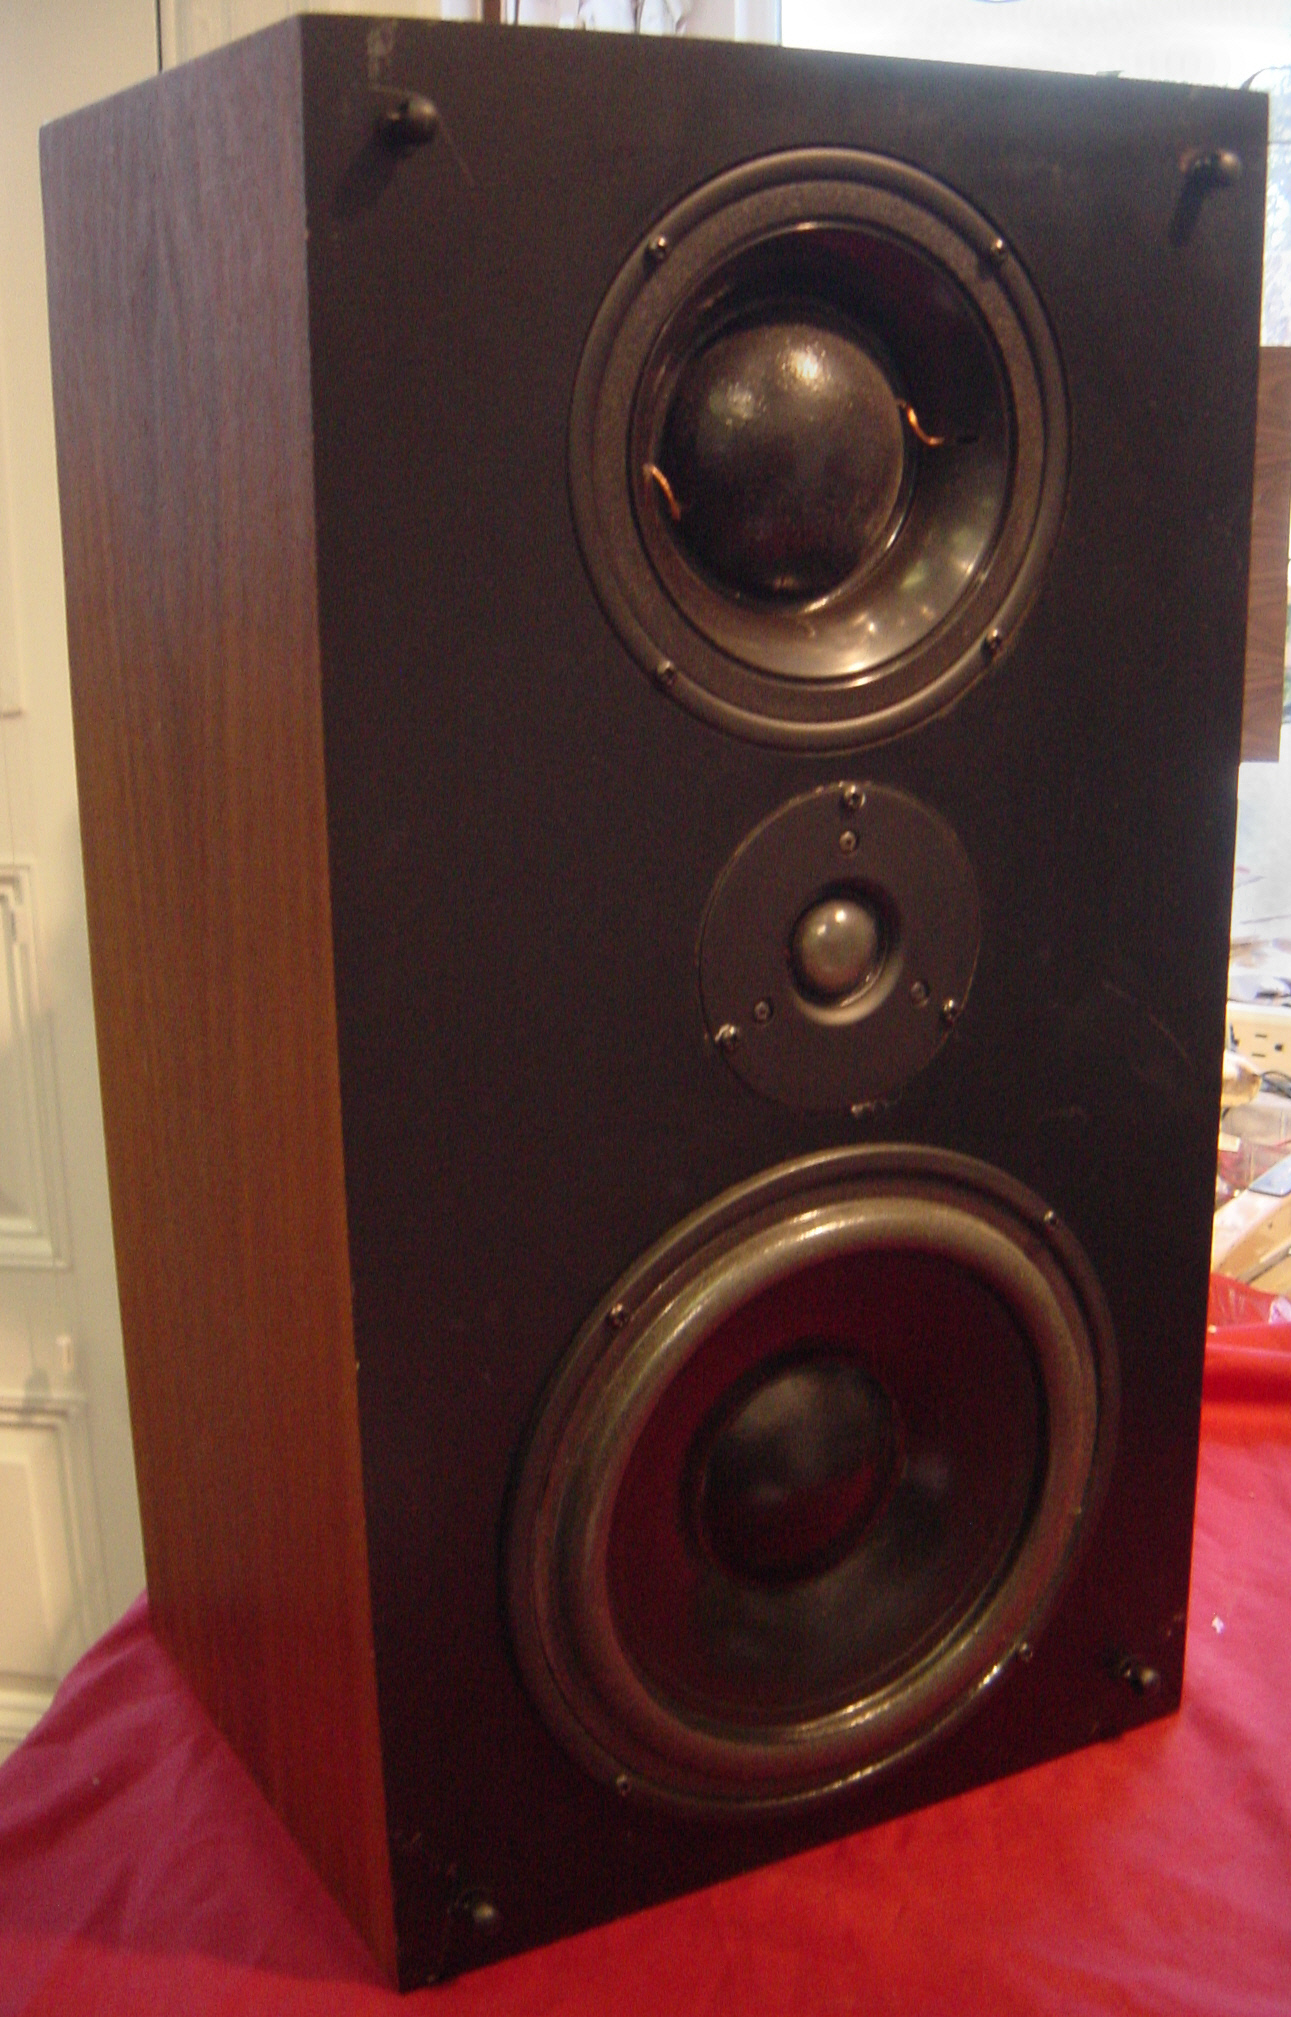 Audio Studio - Used Speakers